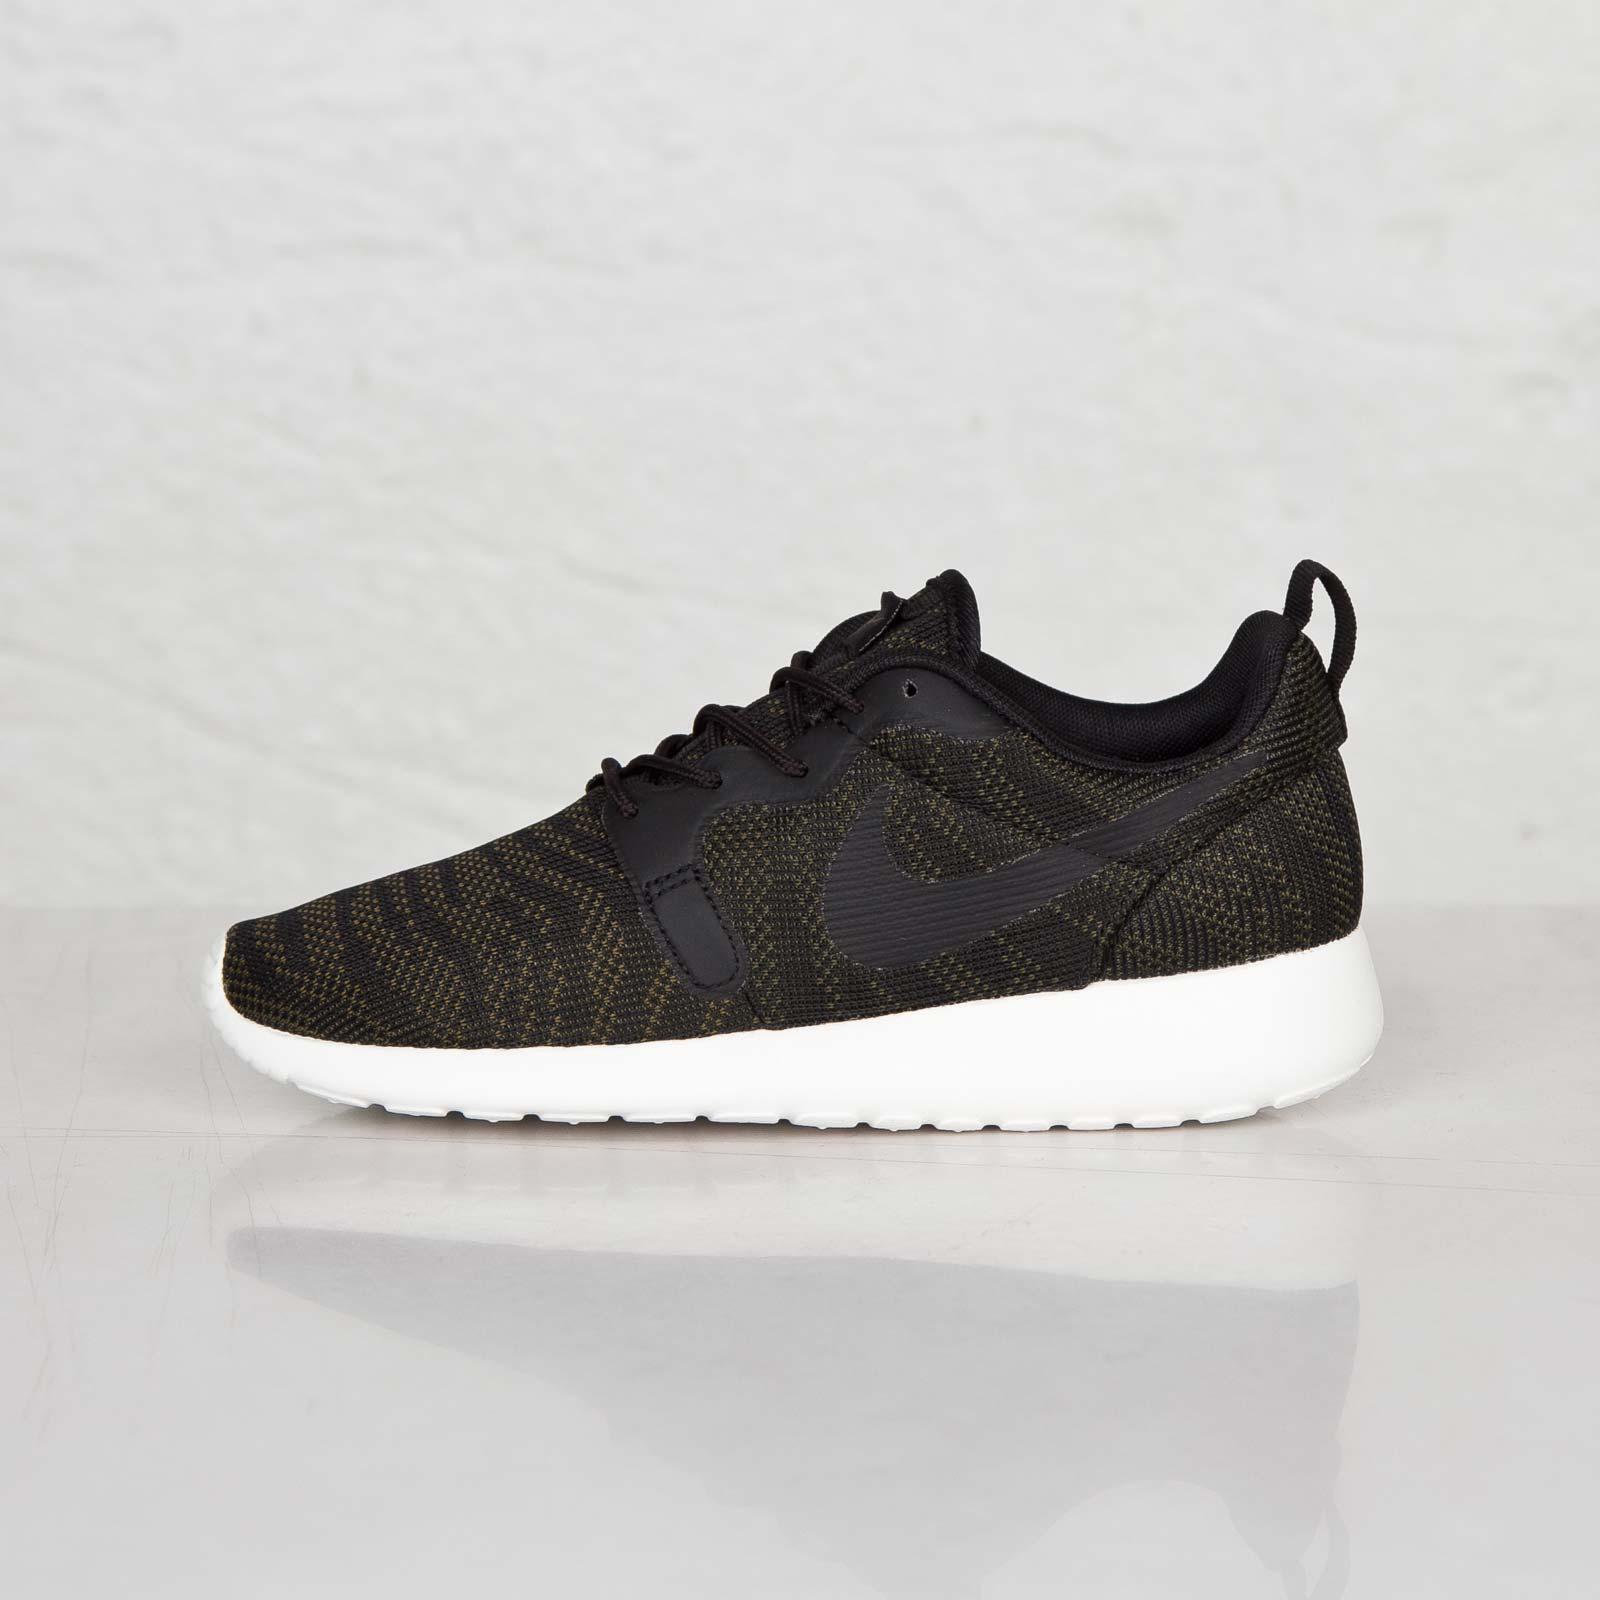 6d48a2cd68594 Nike Wmns Roshe Run Knit Jacquard - 705217-300 - Sneakersnstuff ...